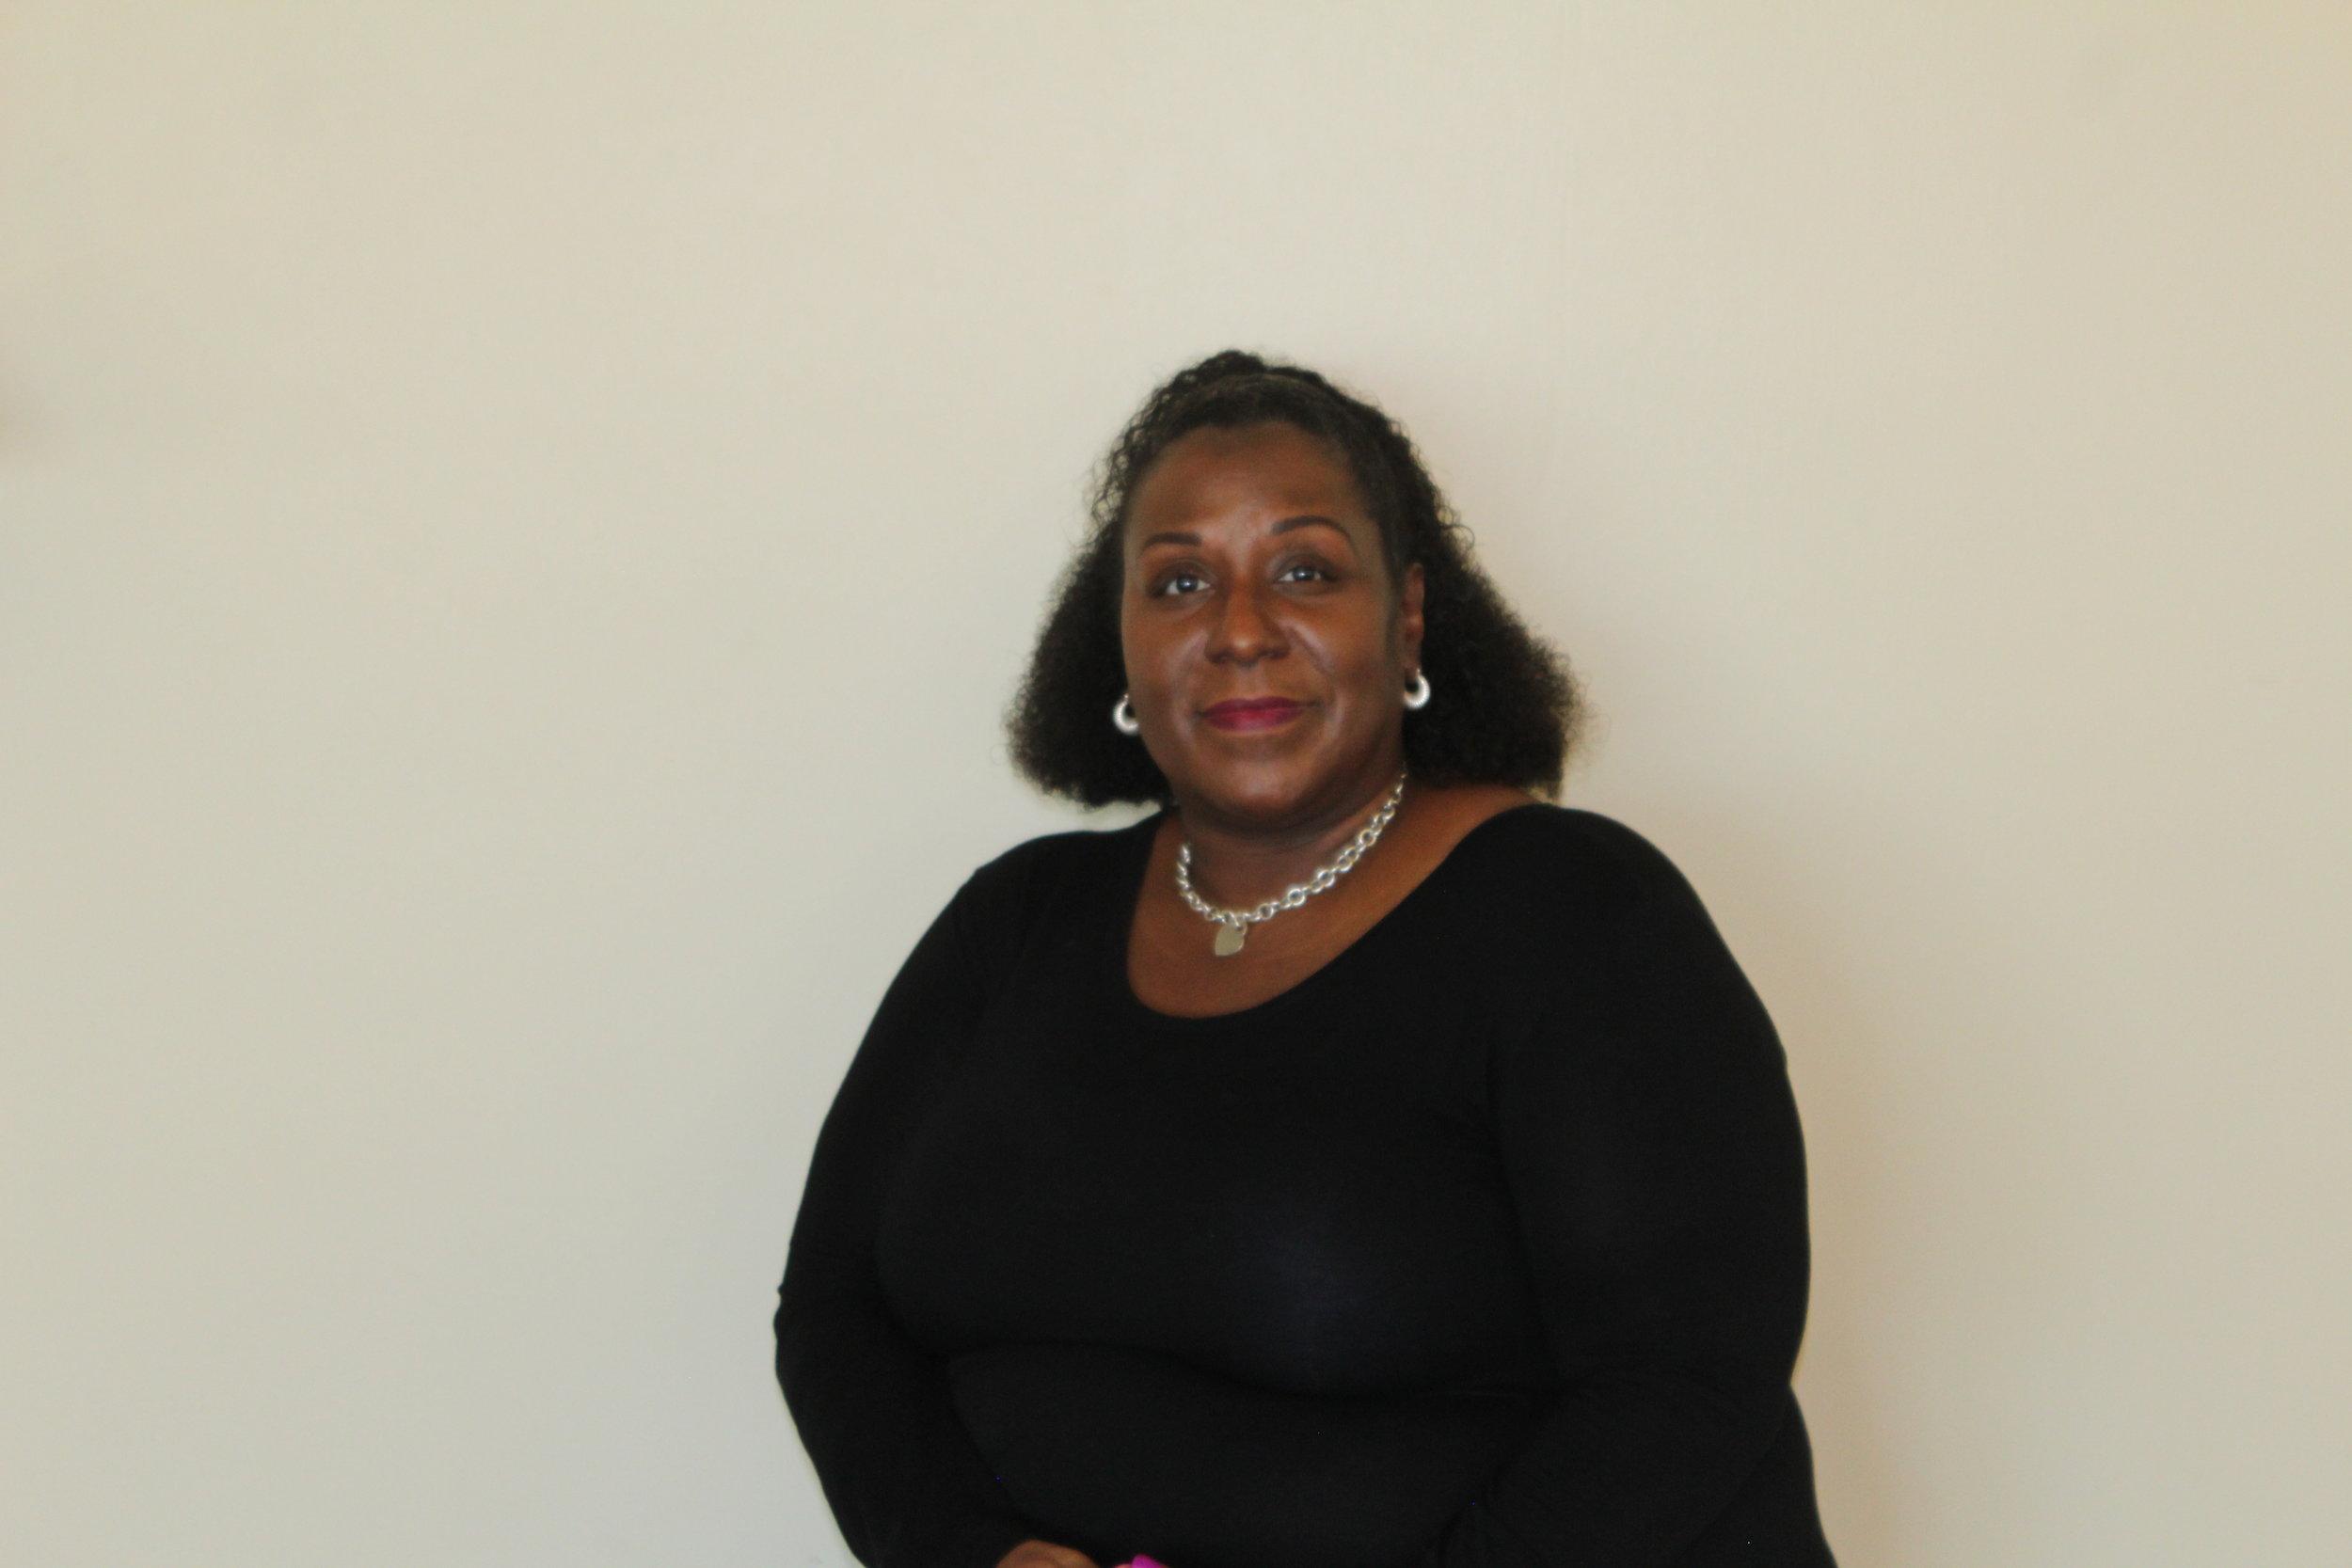 Melanie Hawkins, Assistant Principal, Dallas ISD